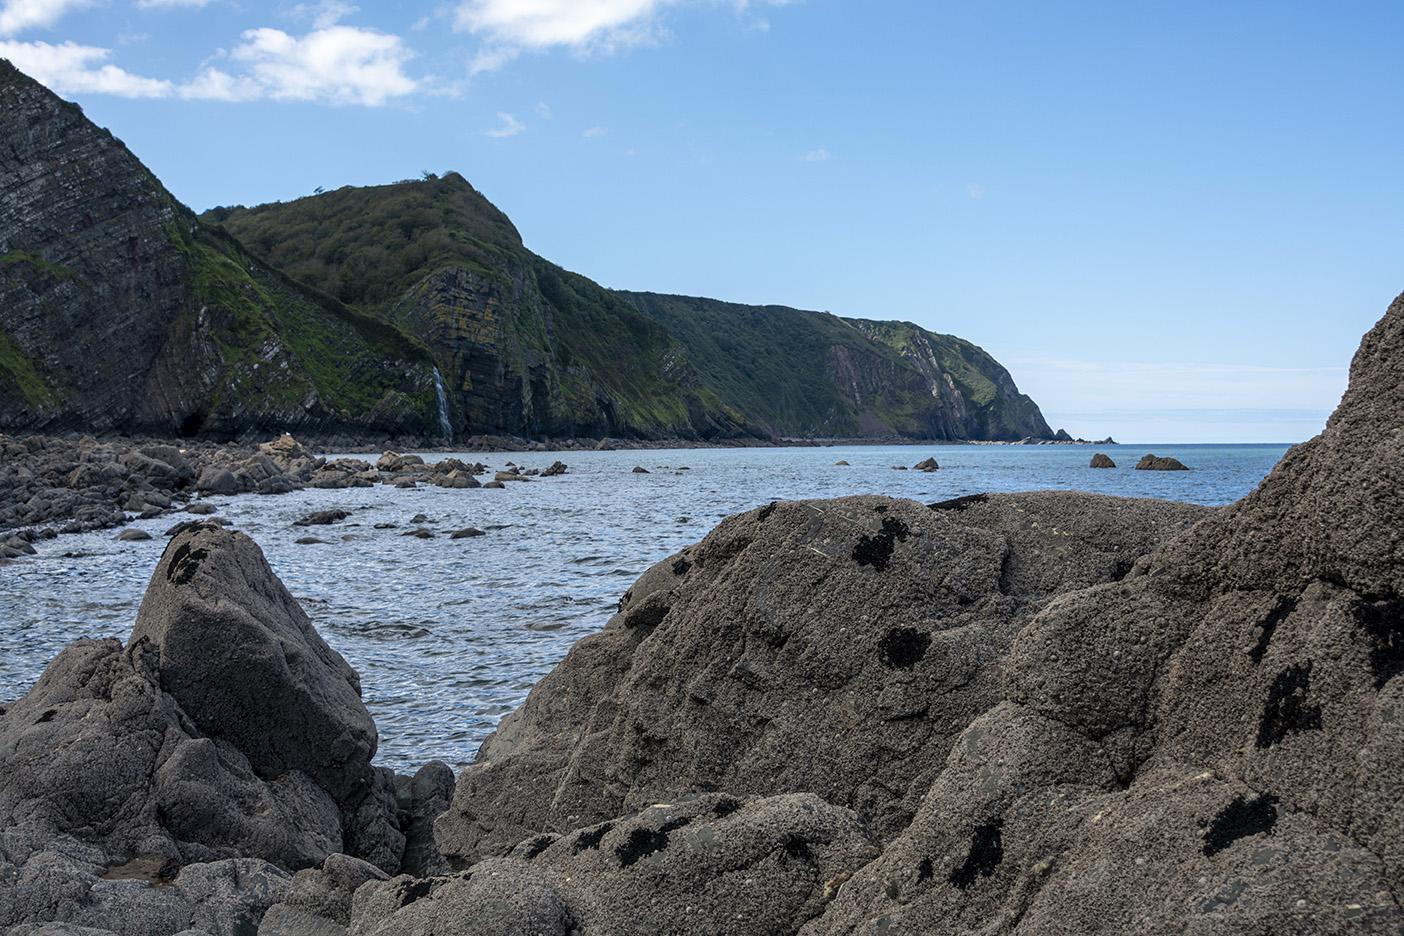 Coastline - Mouthmill Beach